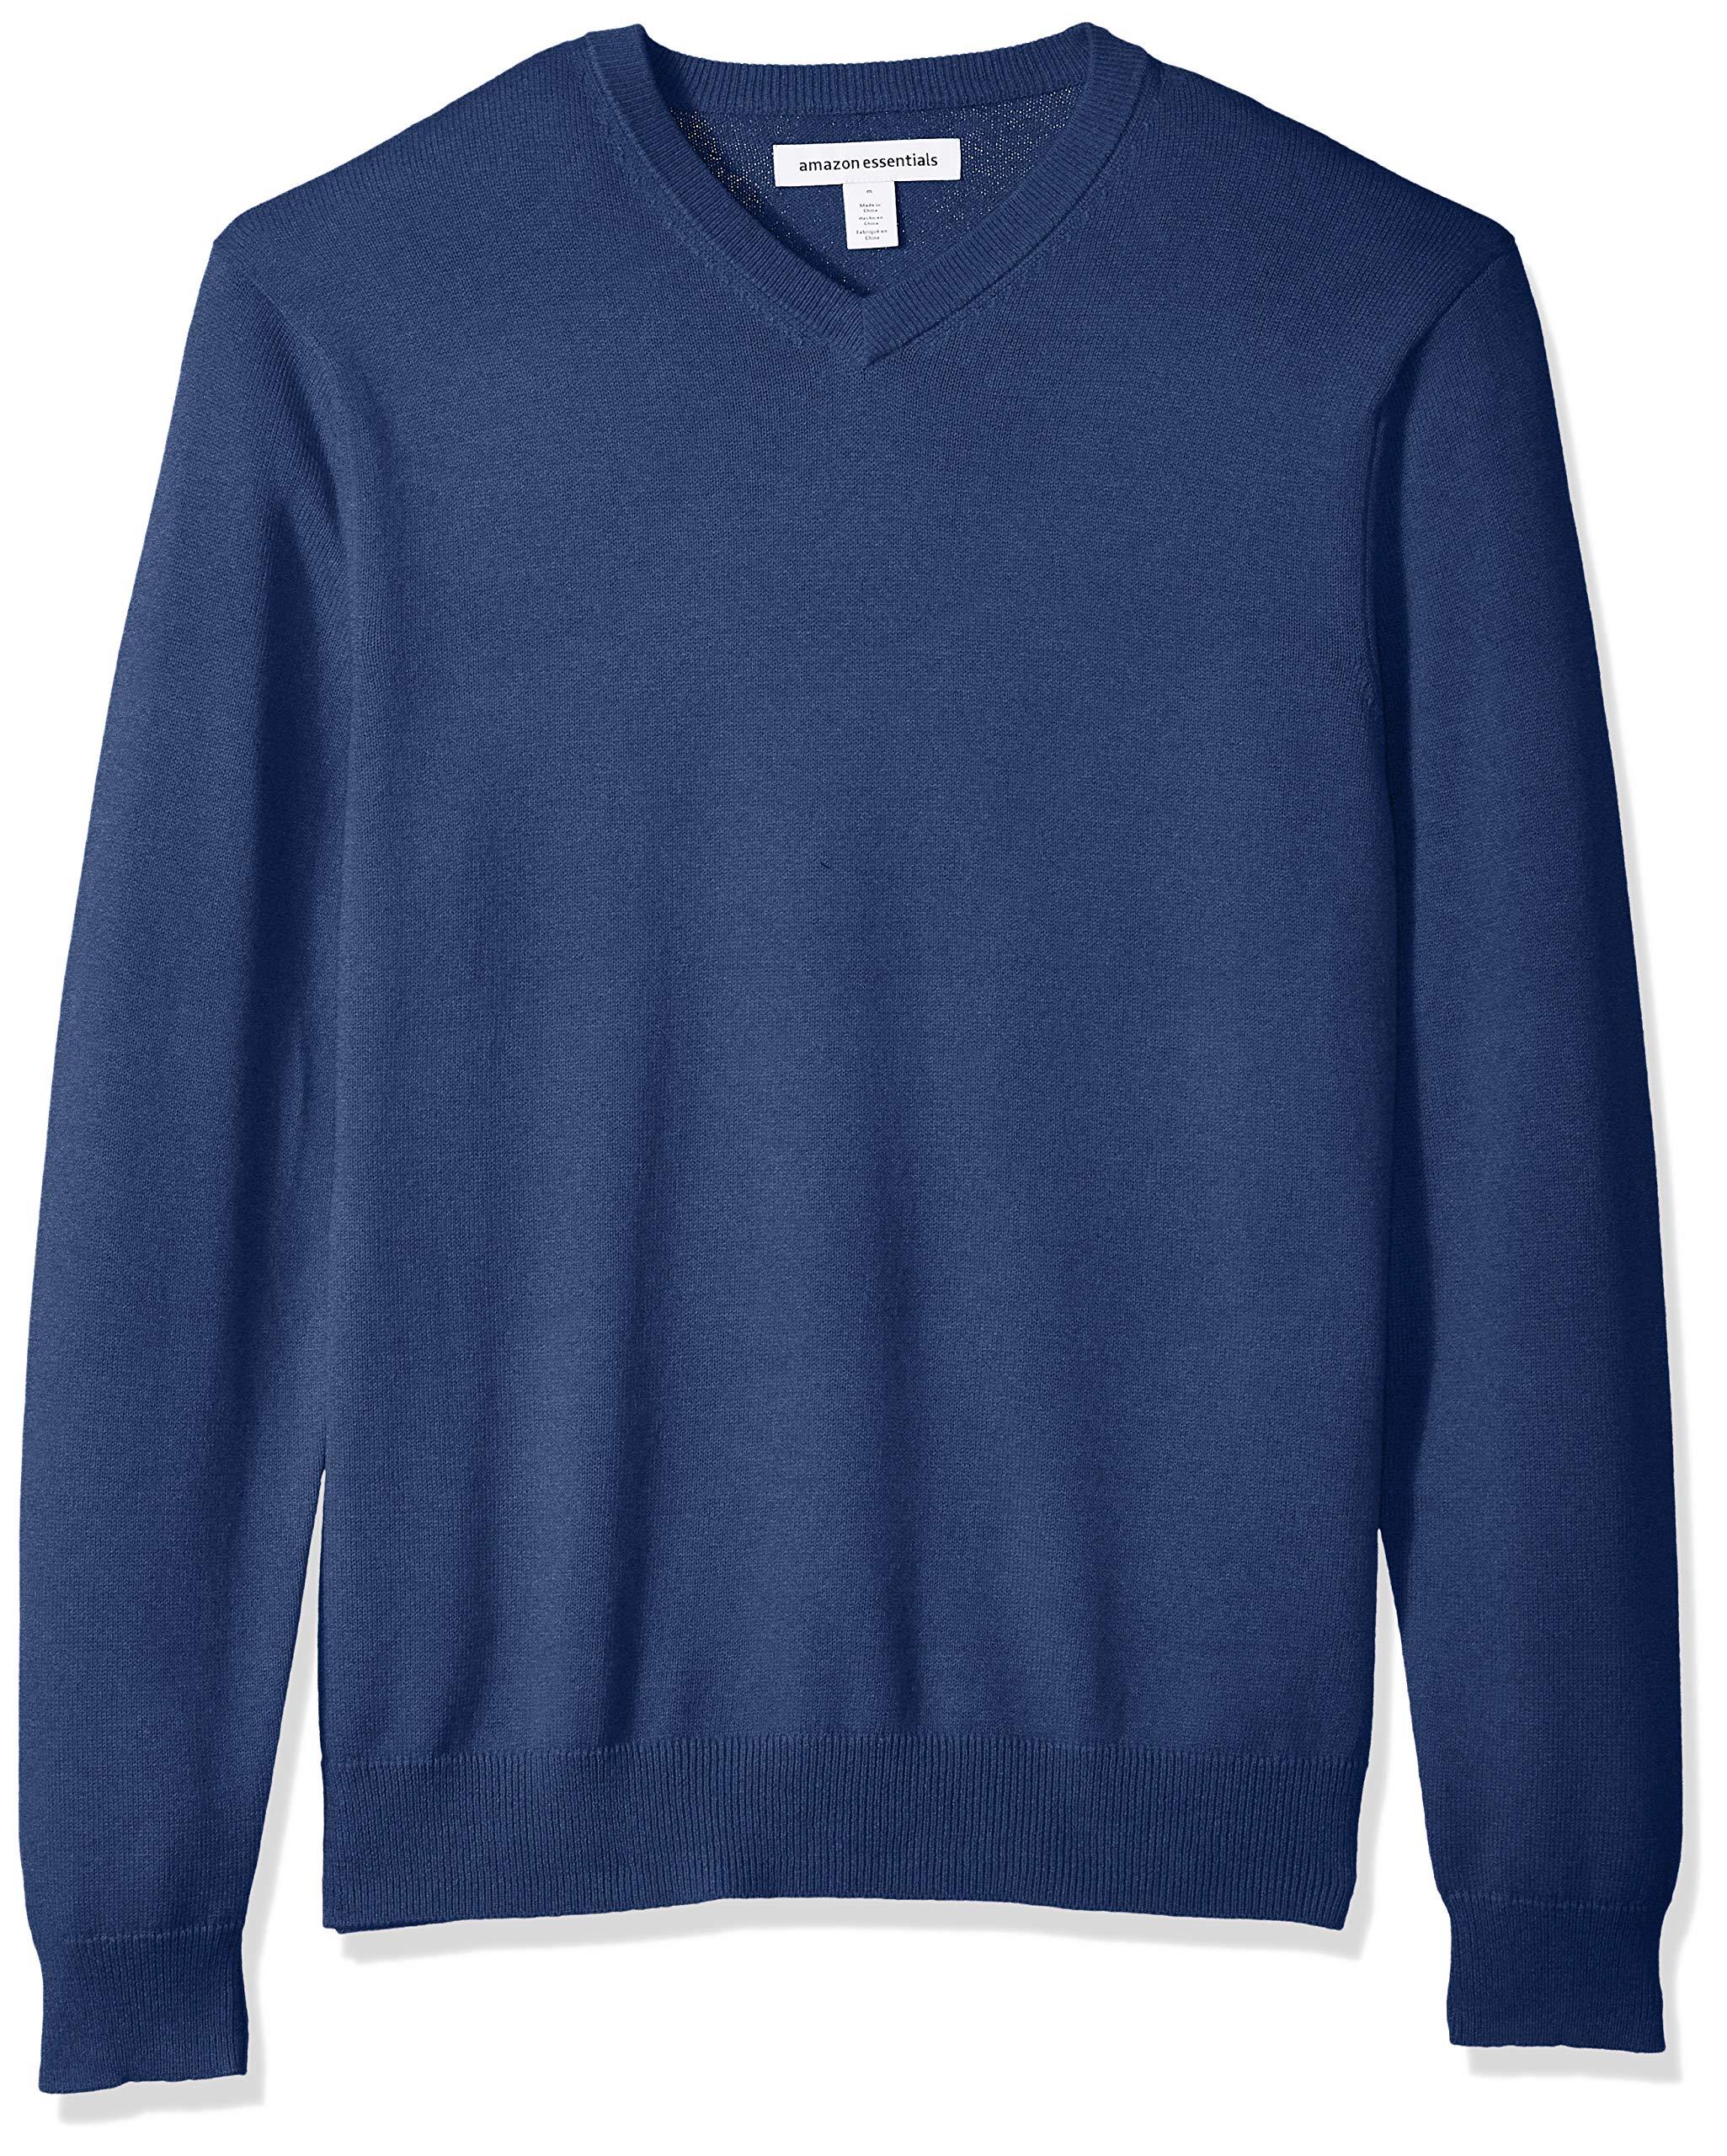 Amazon Essentials Men's Standard V-Neck Sweater, Blue Heather, Large